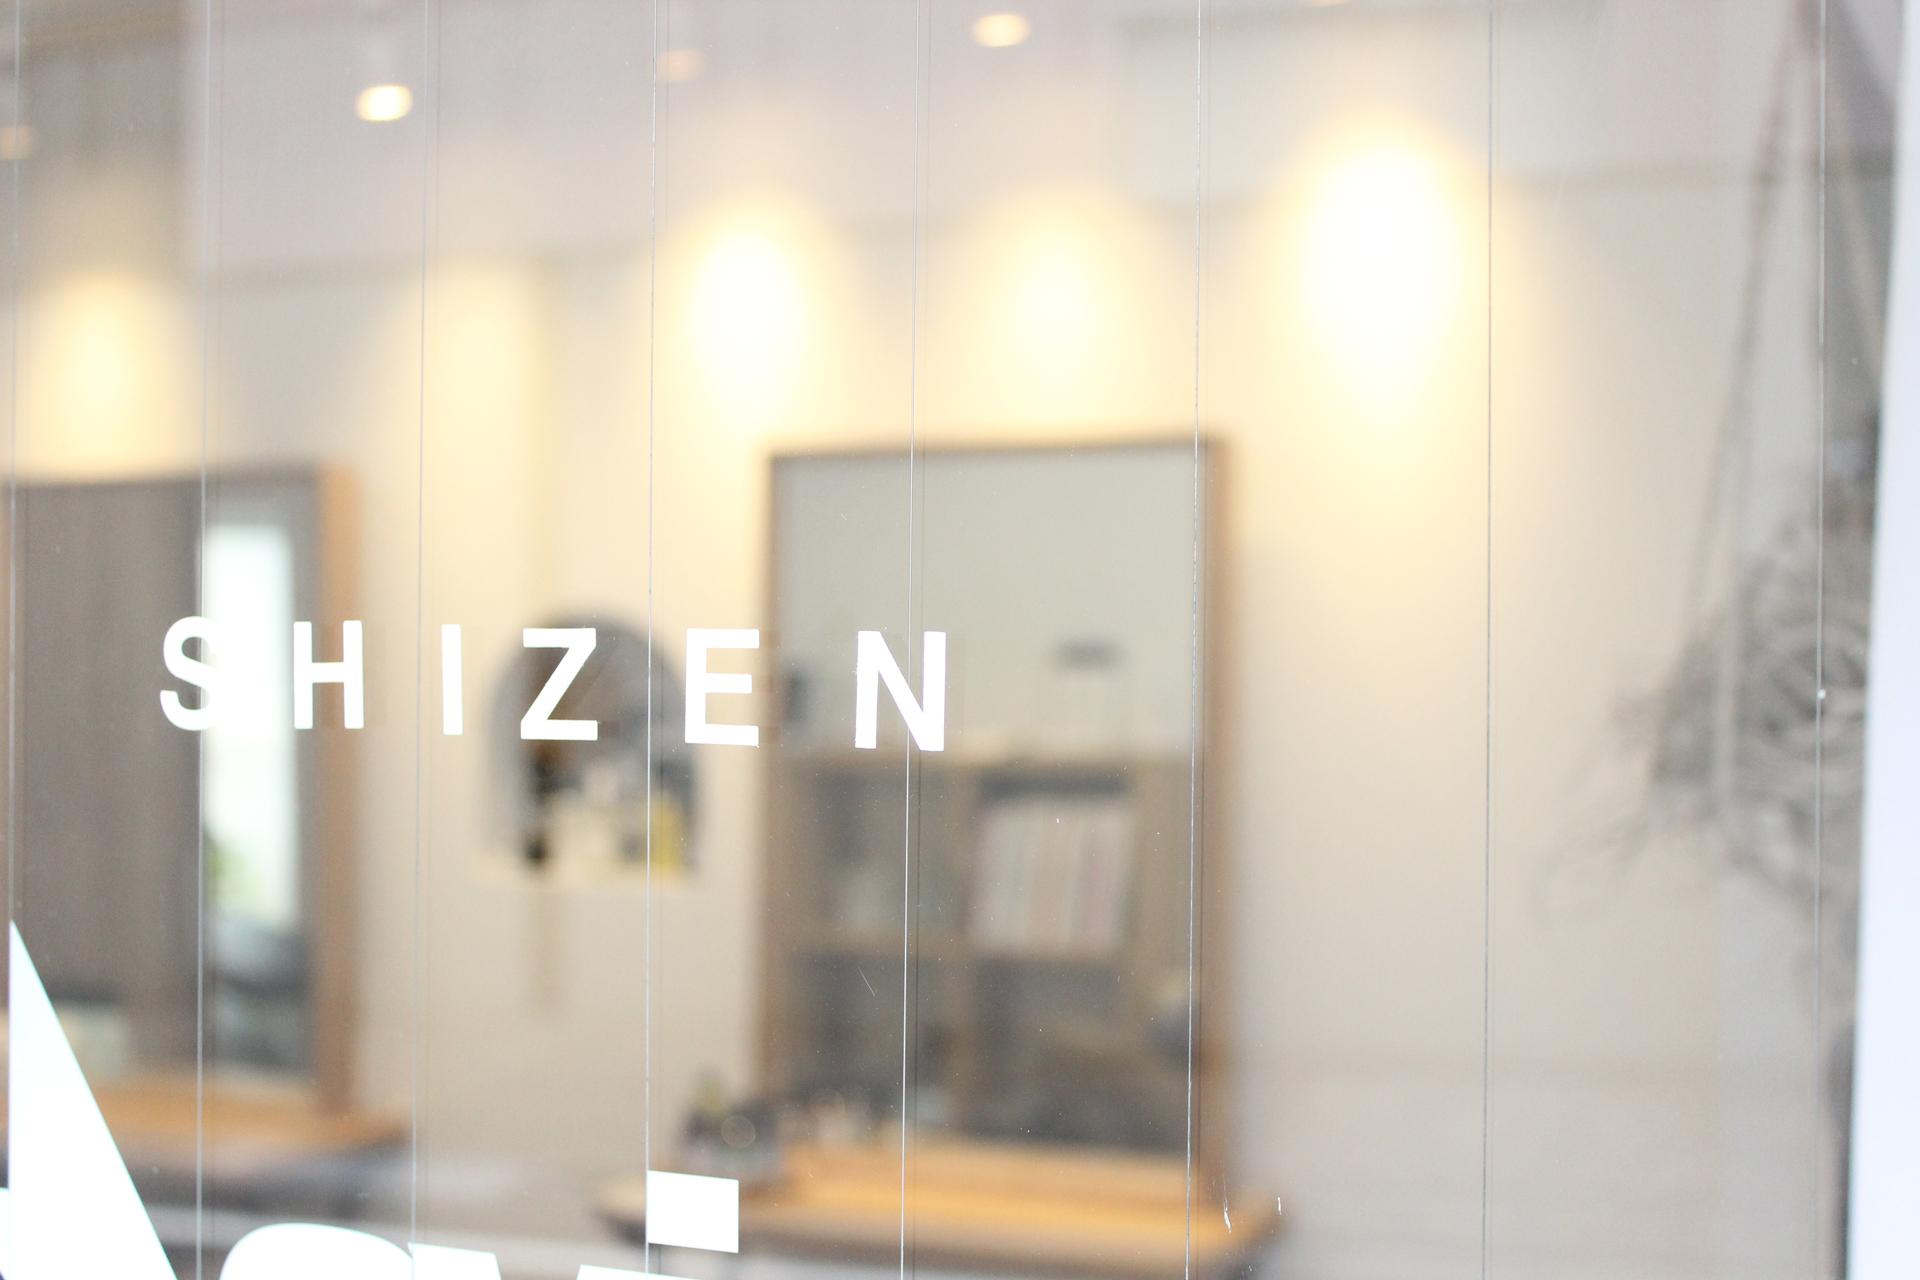 SHIZEN 美容室外観